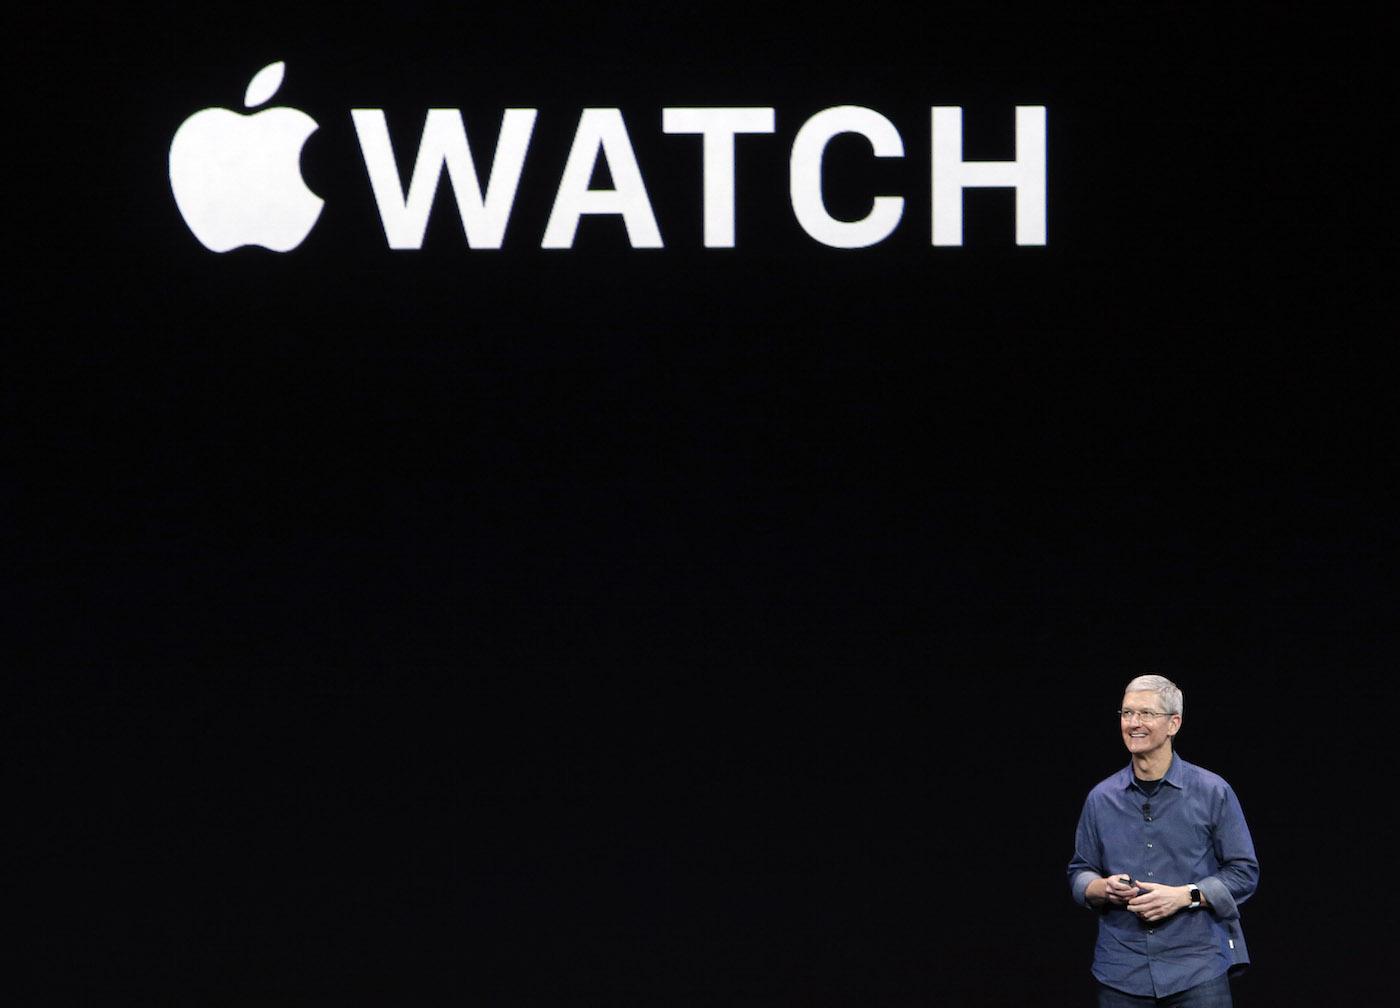 tim-cook-apple-watch-intro-ap